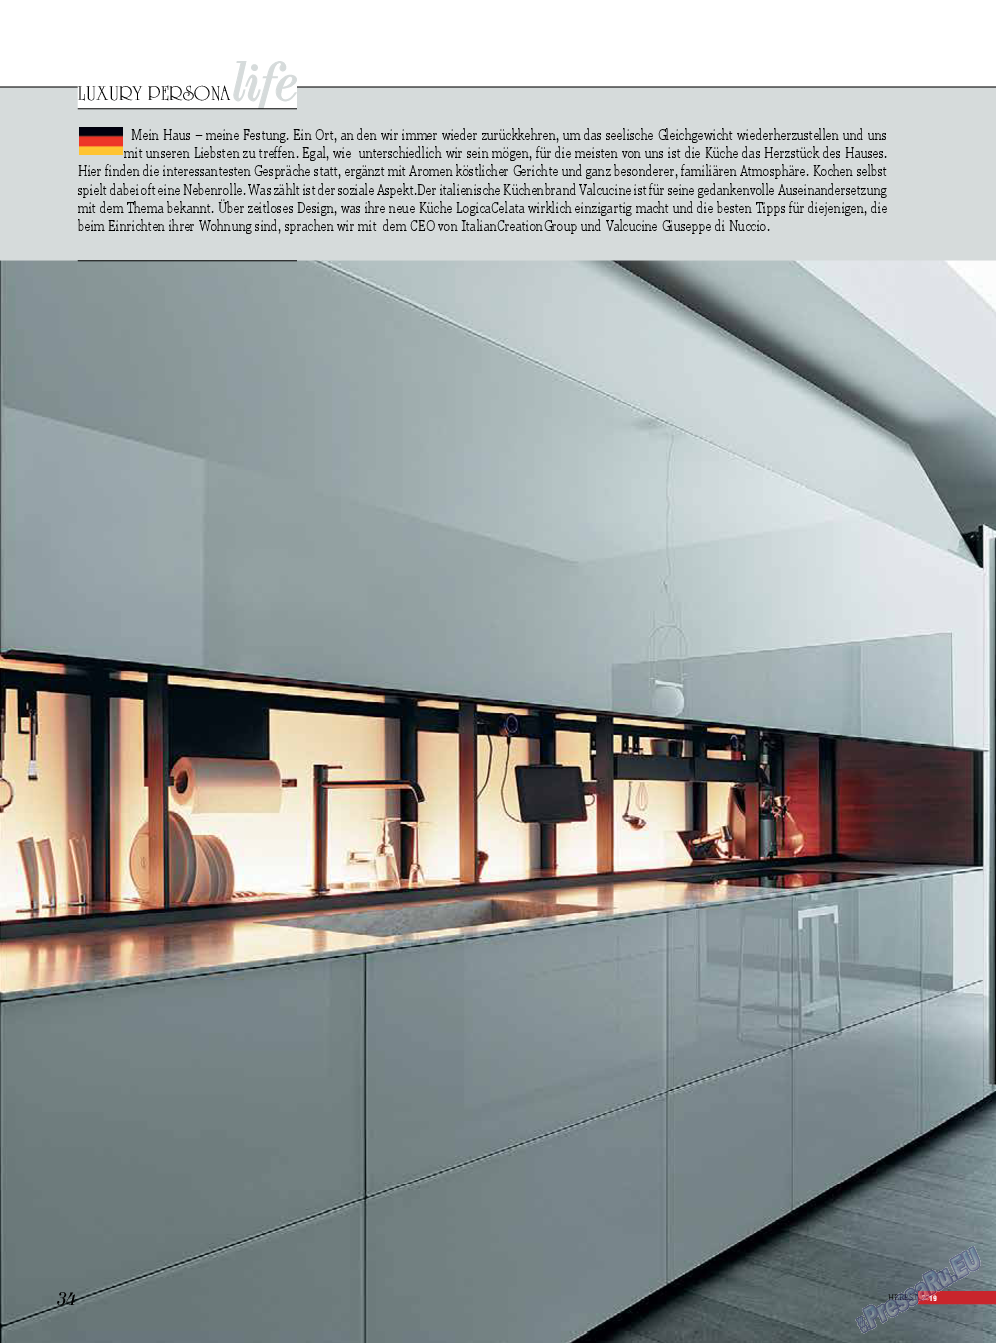 Life in Франкфурт (журнал). 2019 год, номер 44, стр. 34